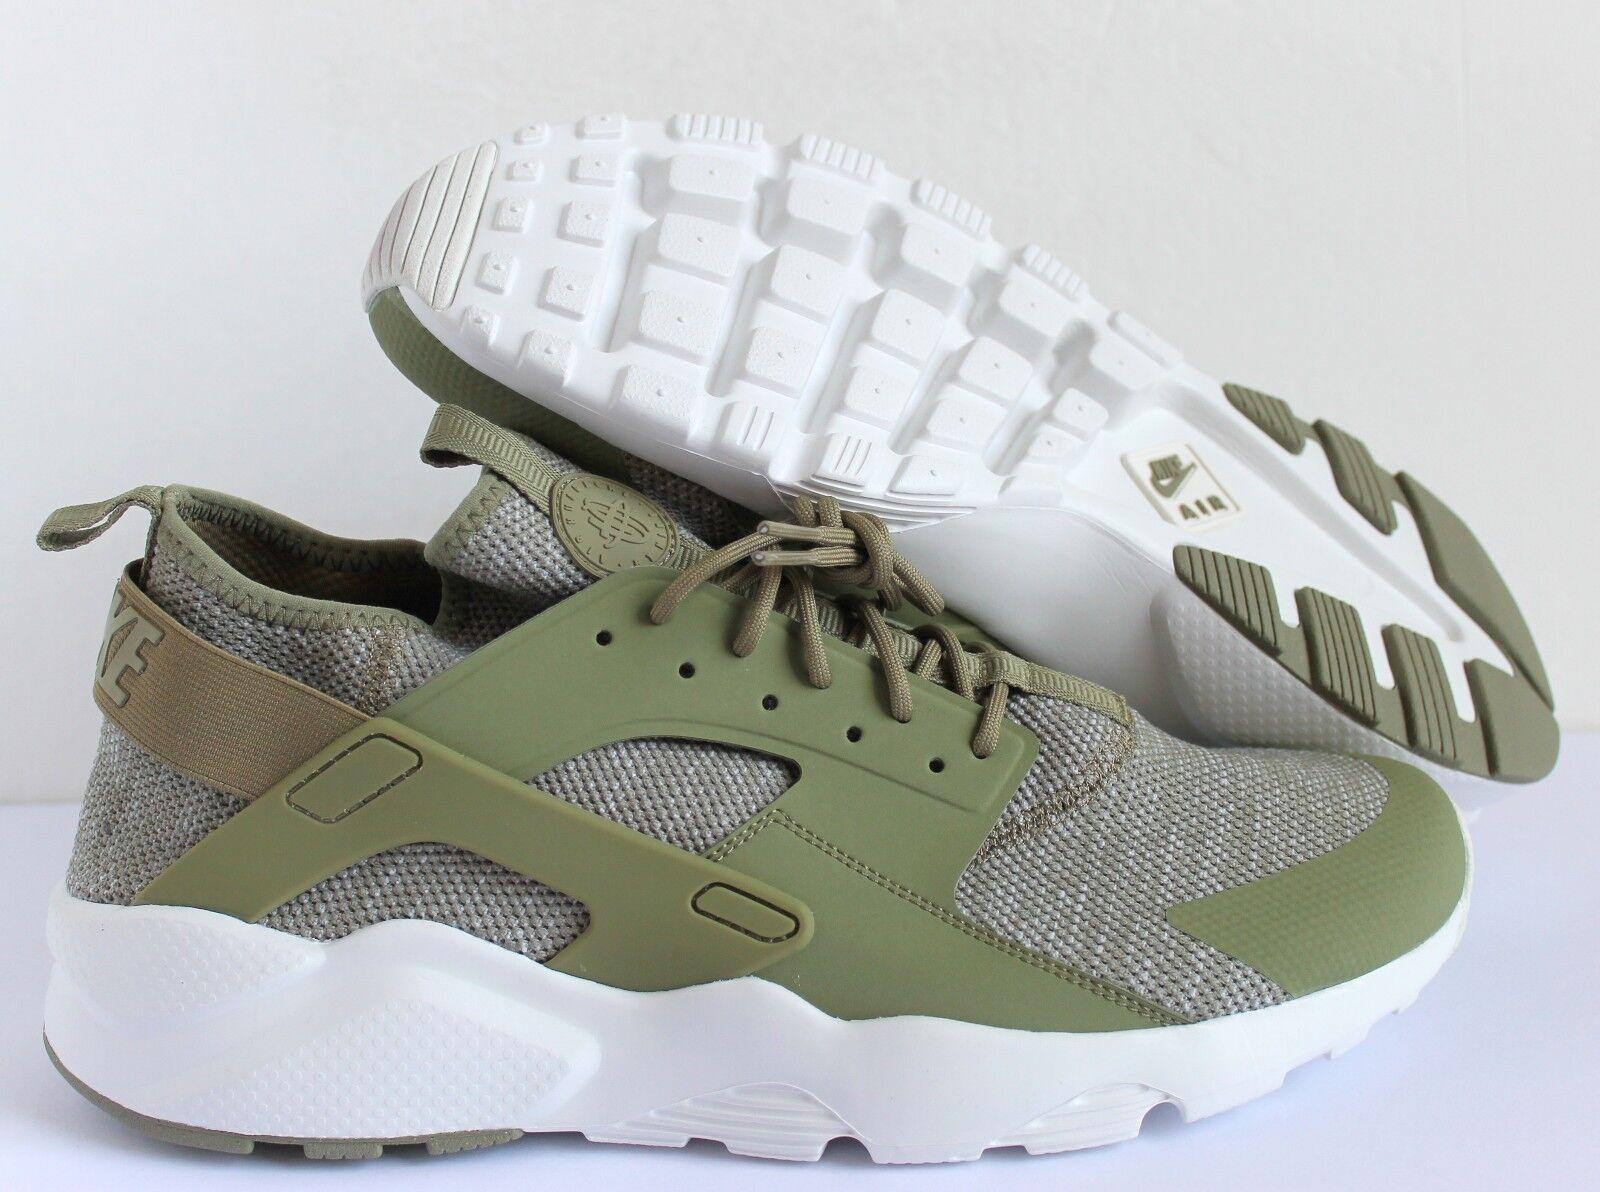 Nike Air Huarache Run Ultra BR Trooper 833147-201 Sz 14 Green Summit White